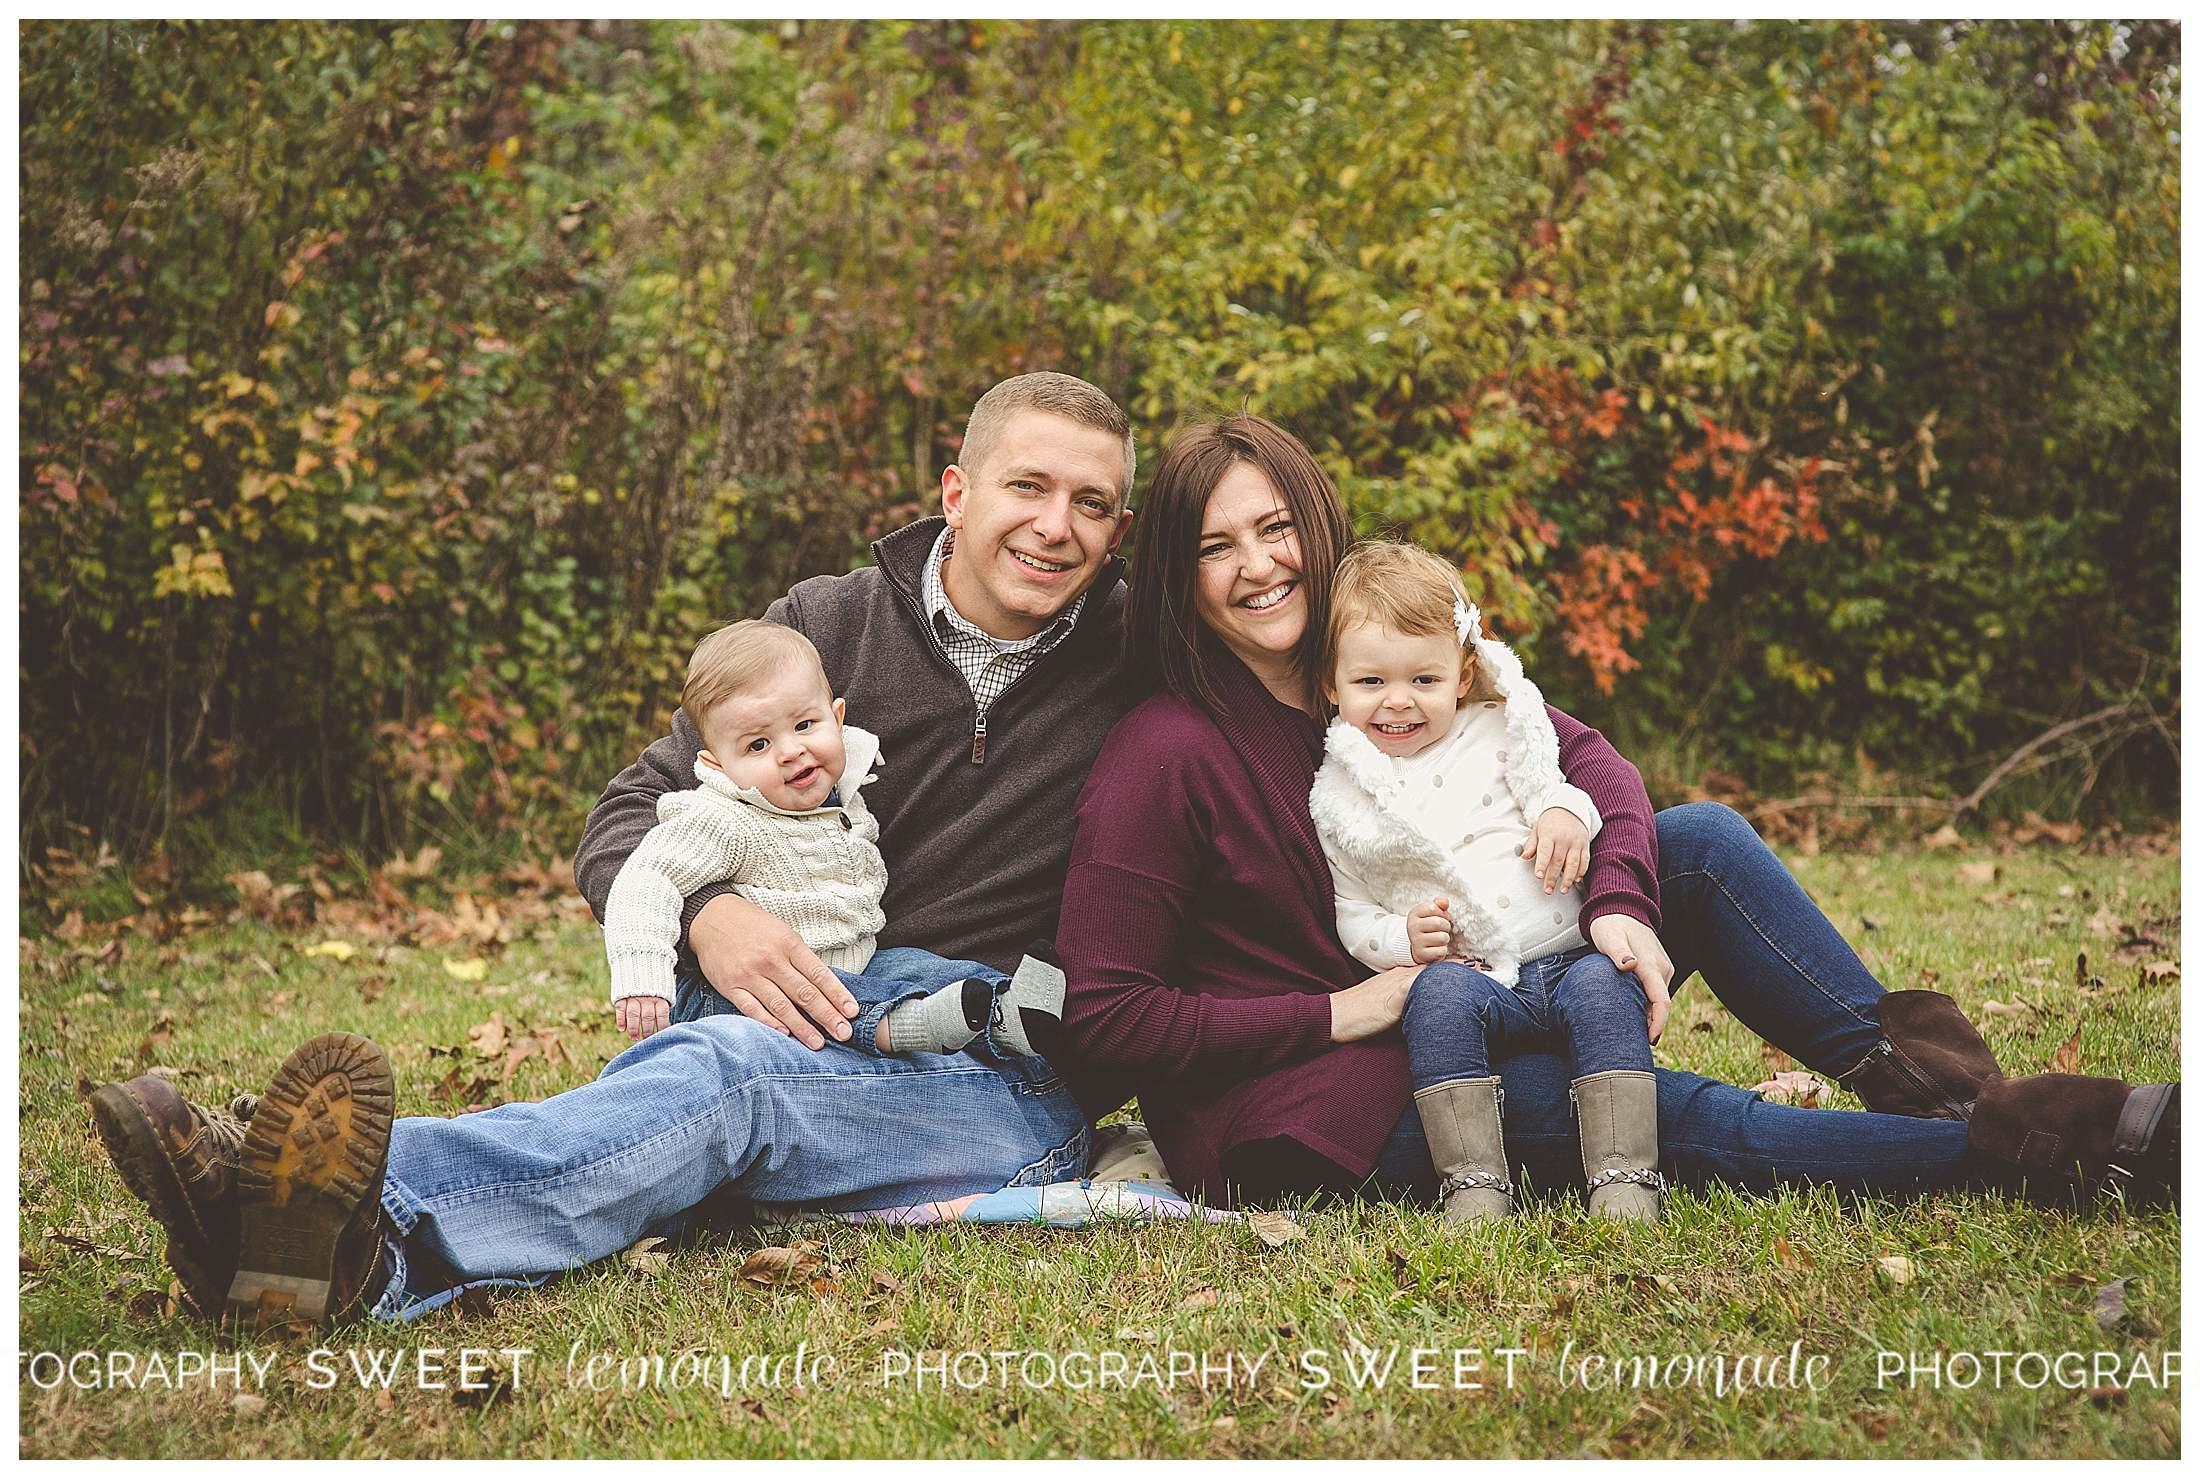 champaign-county-mahomet-illinois-family-photographer-sweet-lemonade-photography_1746.jpg